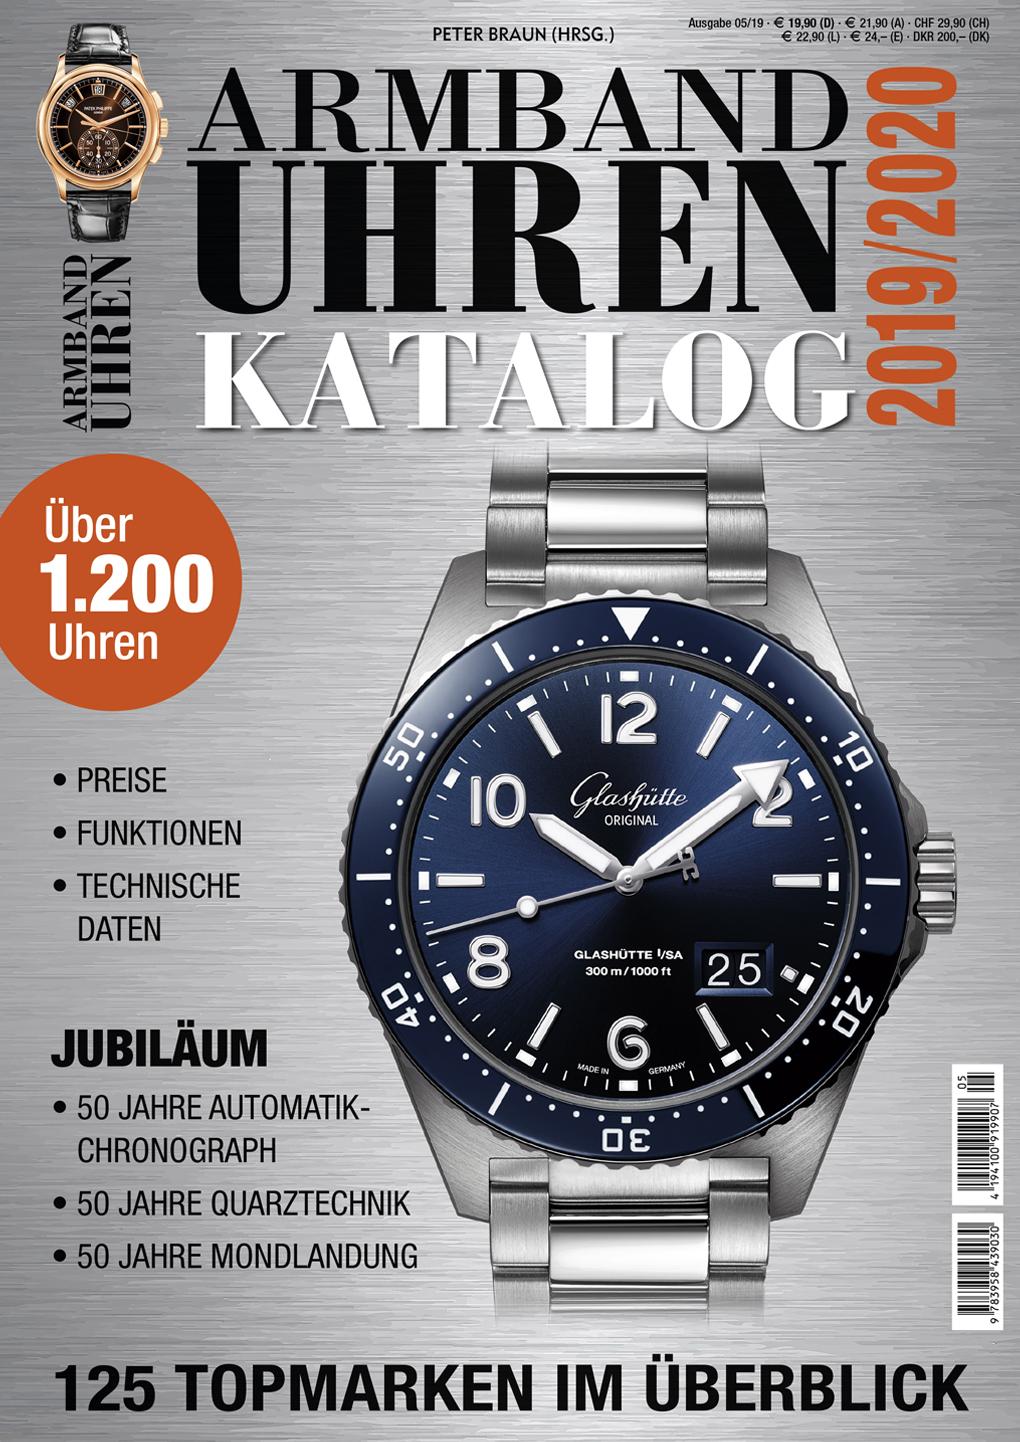 Armbanduhren Katalog 2019/2020